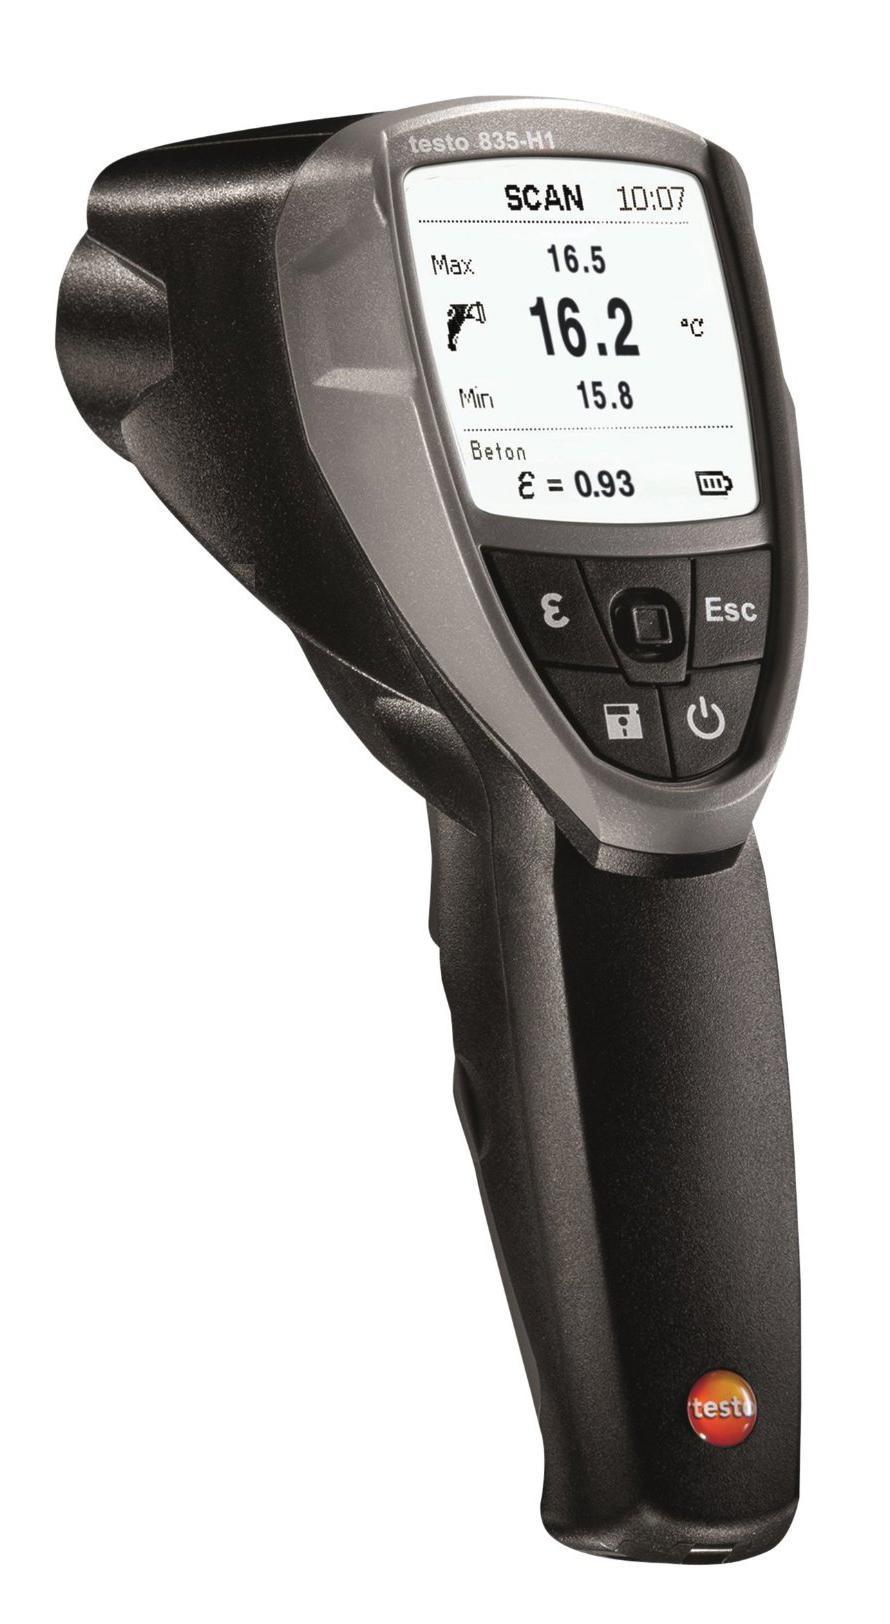 Пирометр (термодетектор) Testo 835-h1